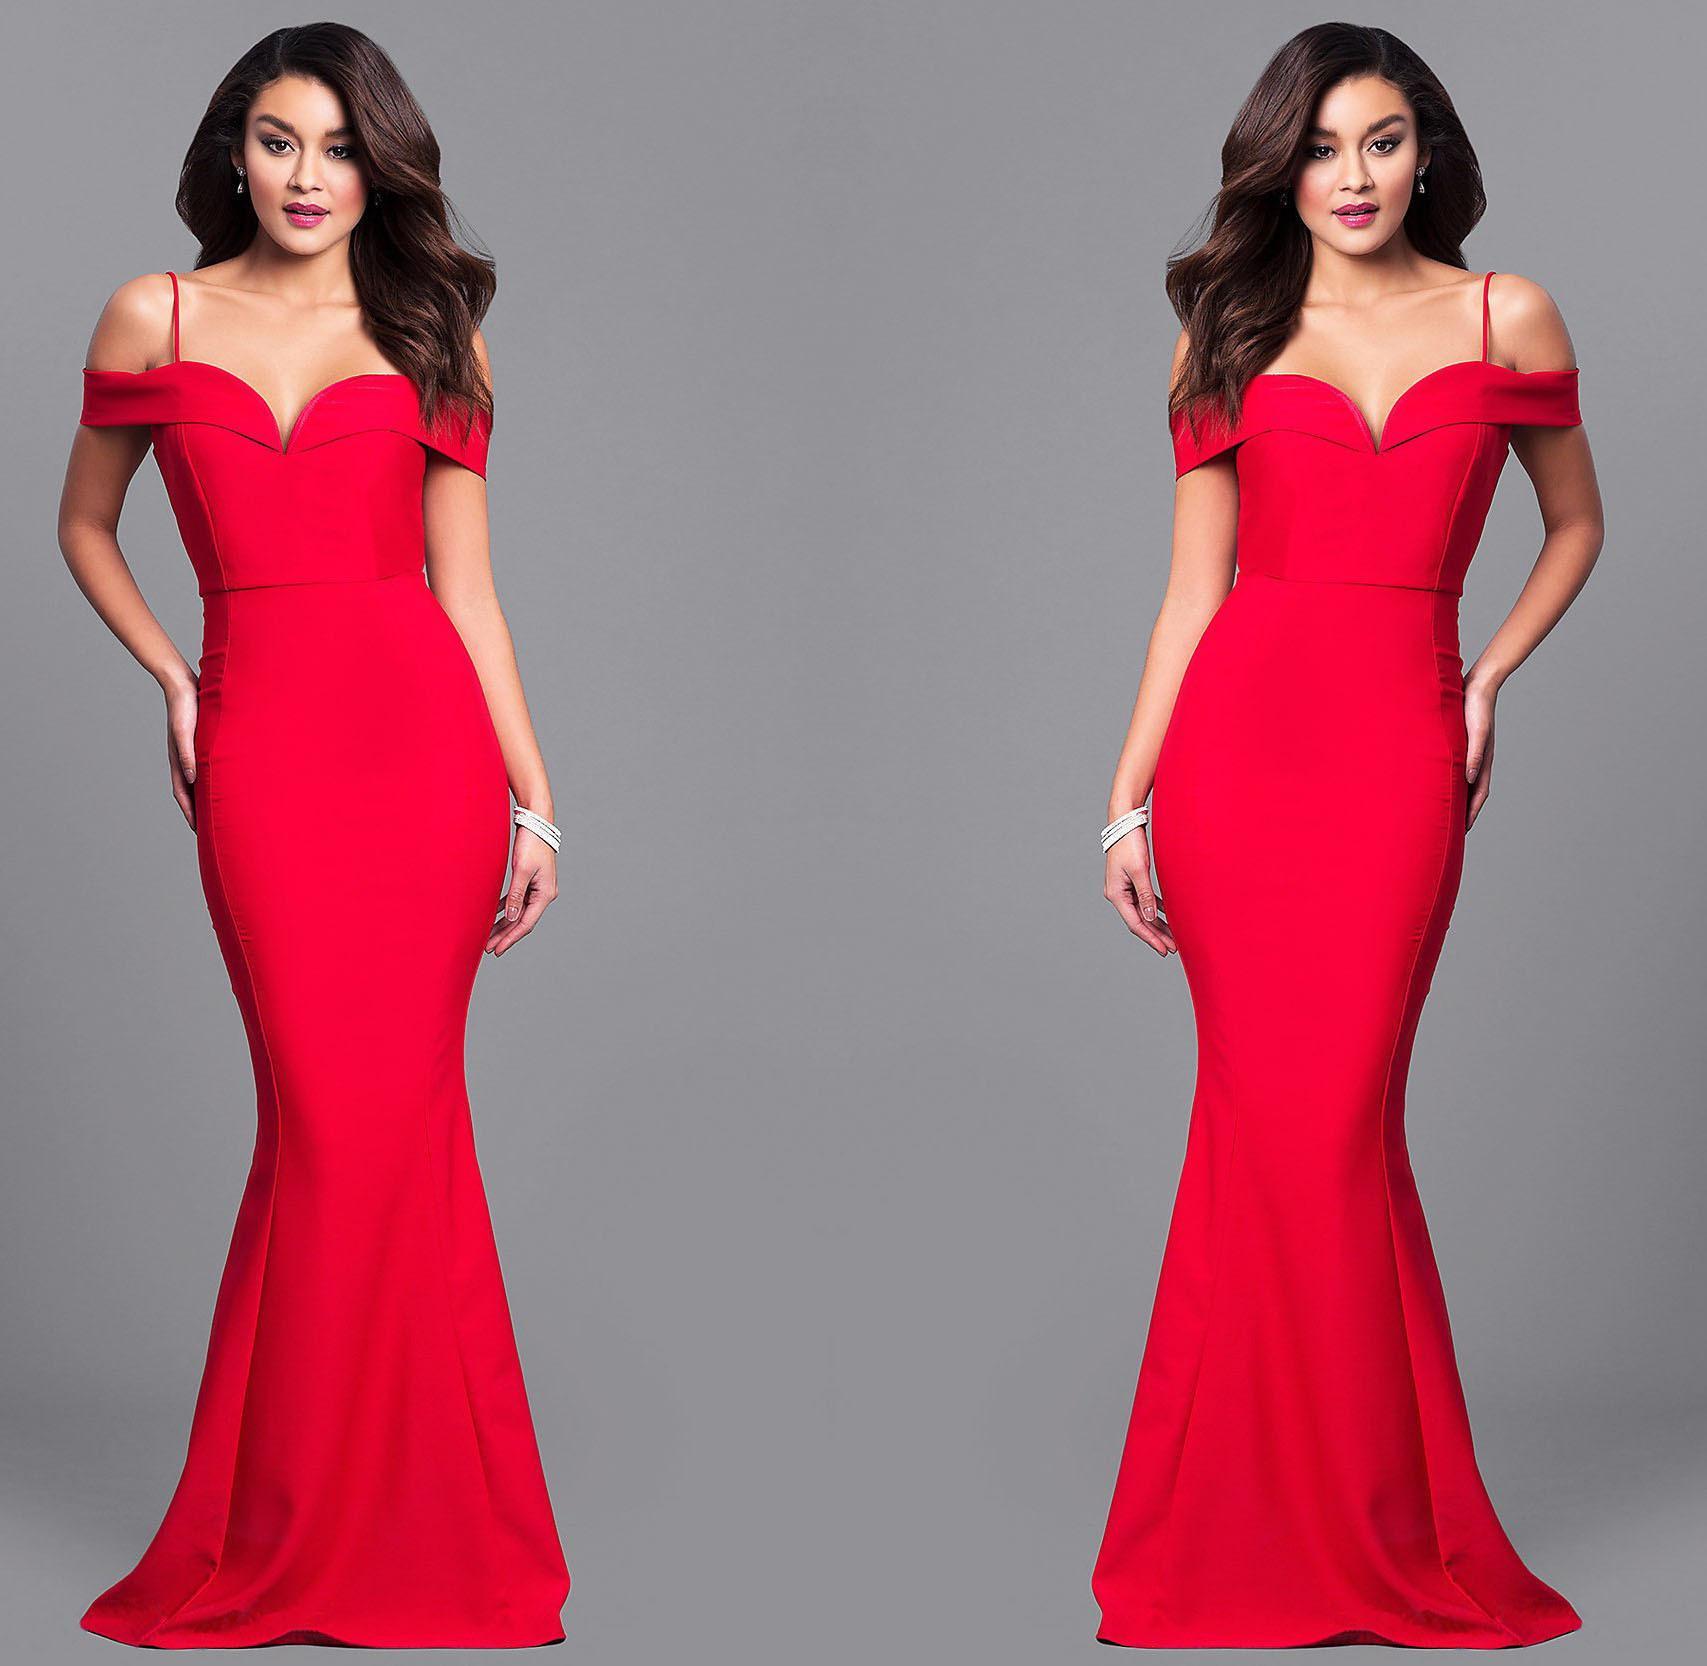 0ba15fbdd 2019 Off Shoulder Black Mermaid Prom Dresses Long Arabic Dress Lace  Appliques Pearls Formal Evening Gowns Zipper Back